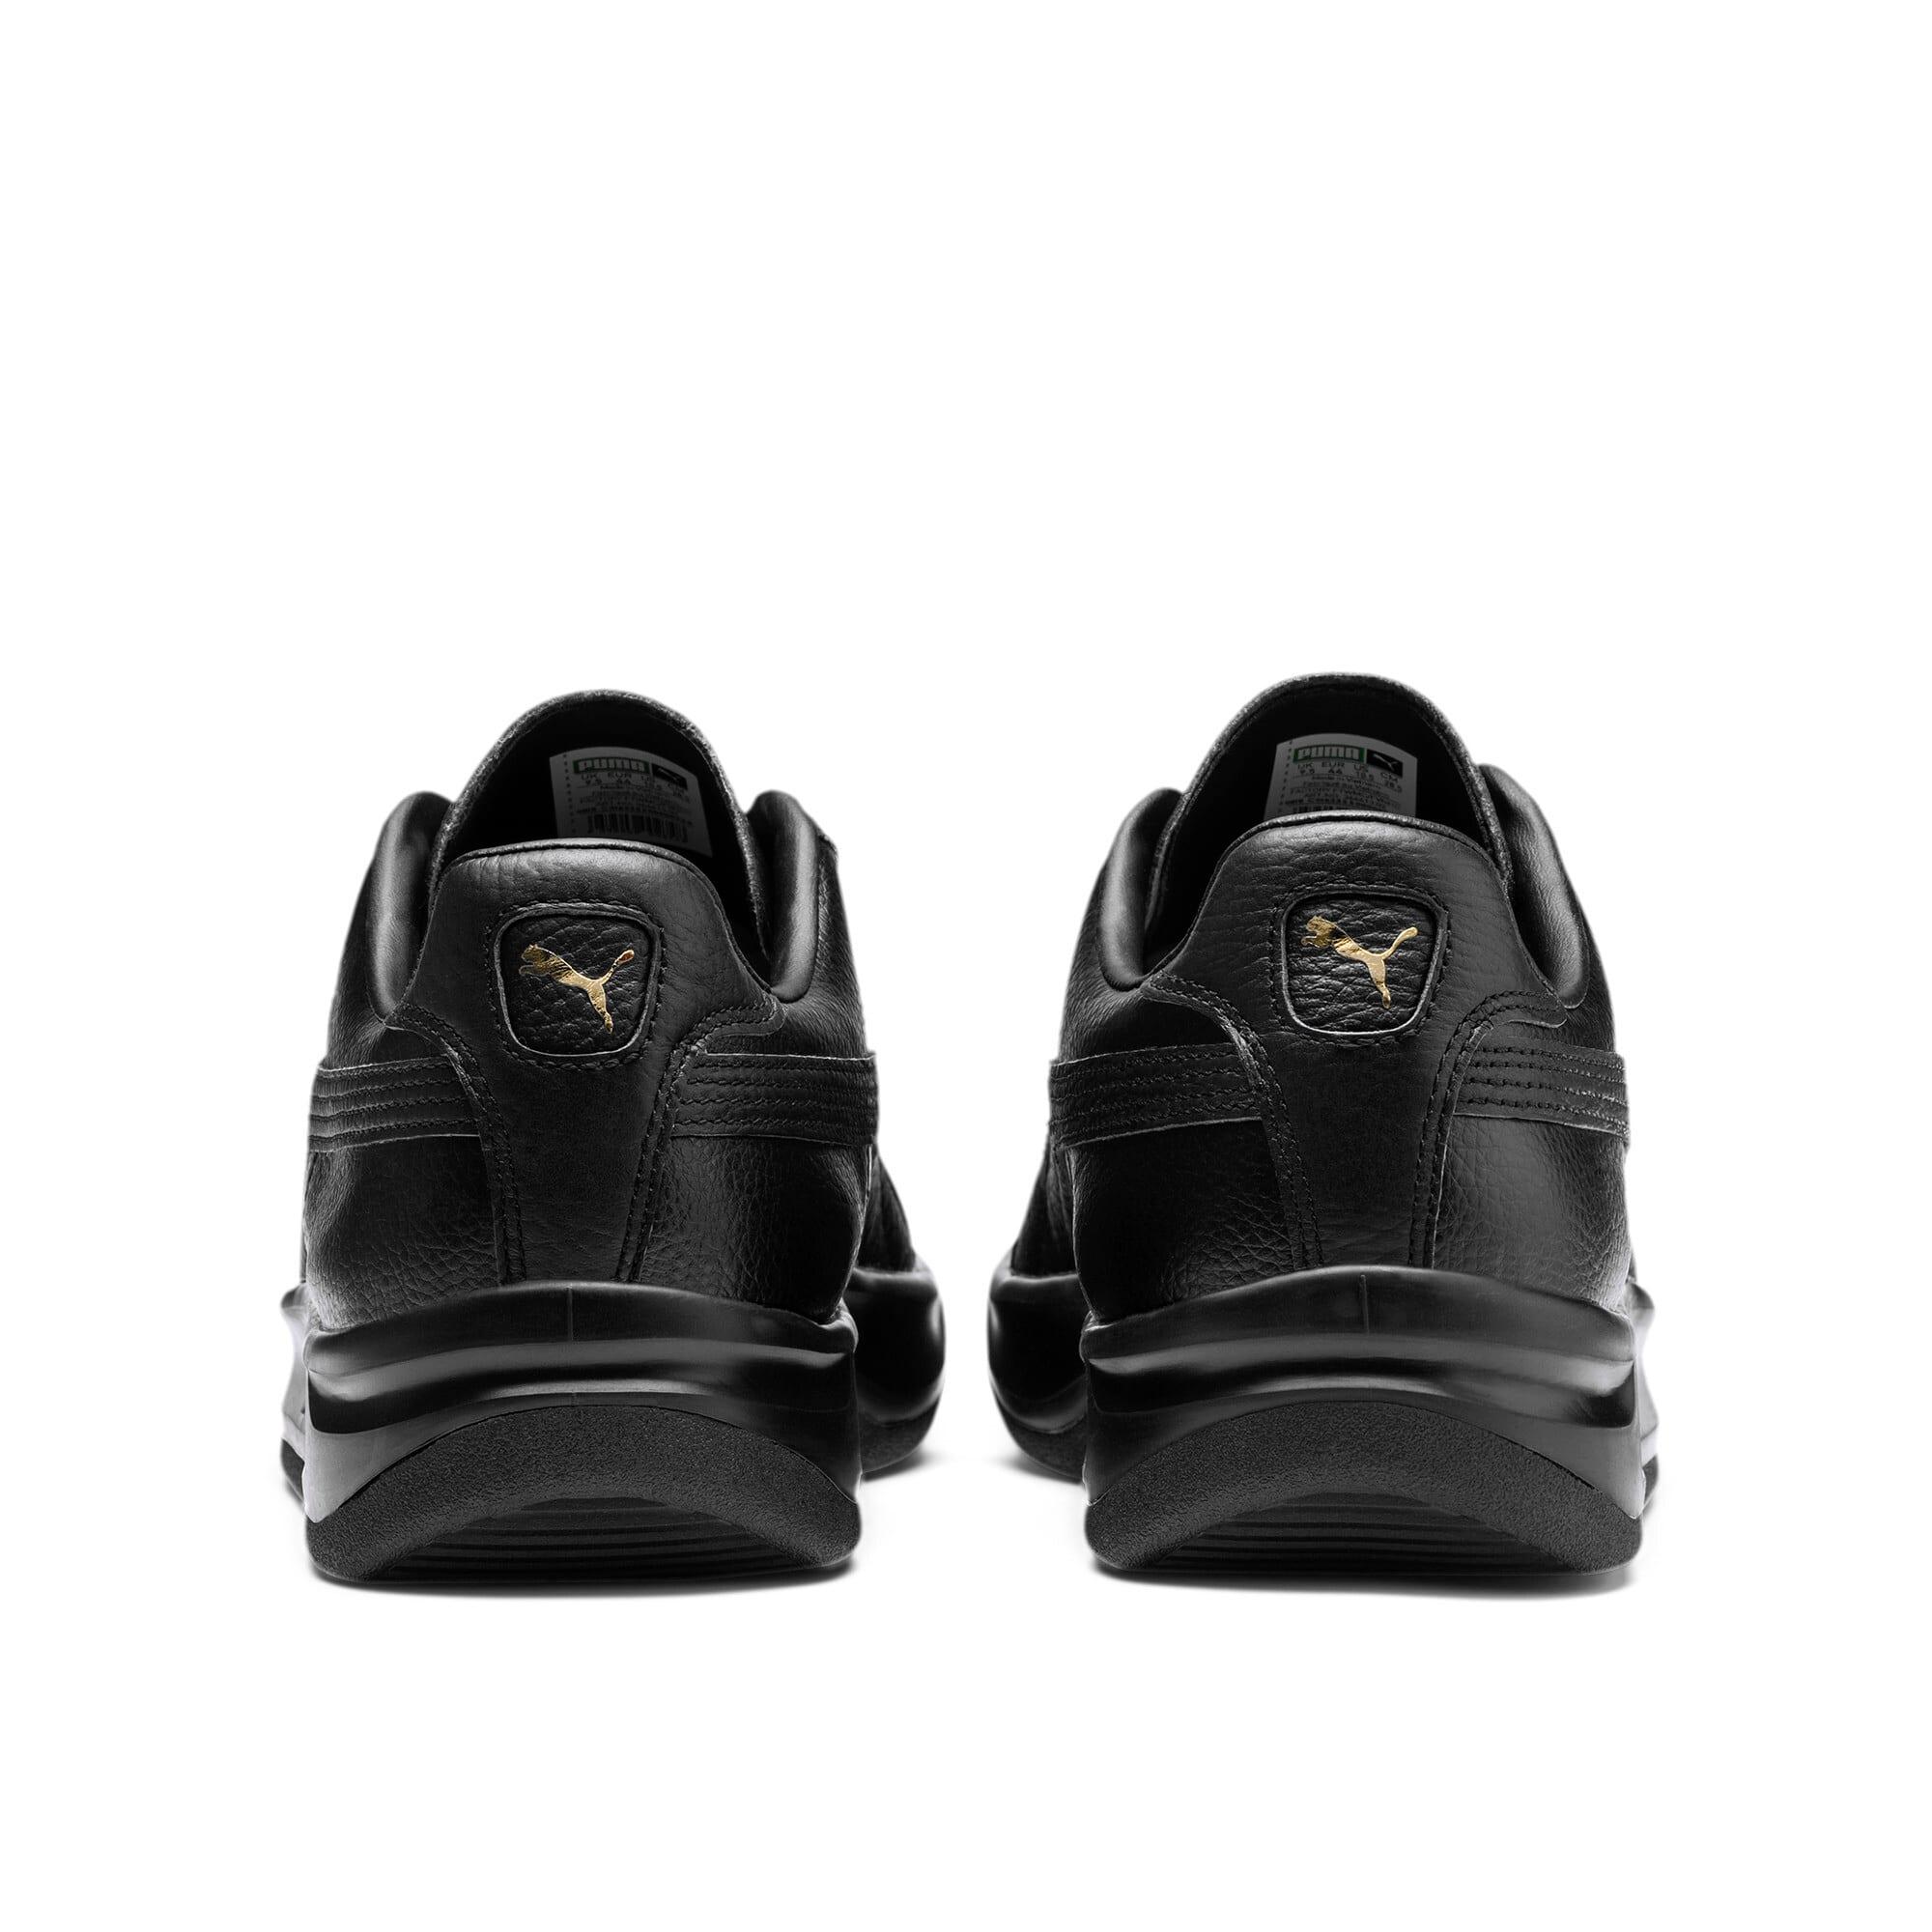 Thumbnail 3 of GV Special+ Sneakers, Puma Black-Puma Black, medium